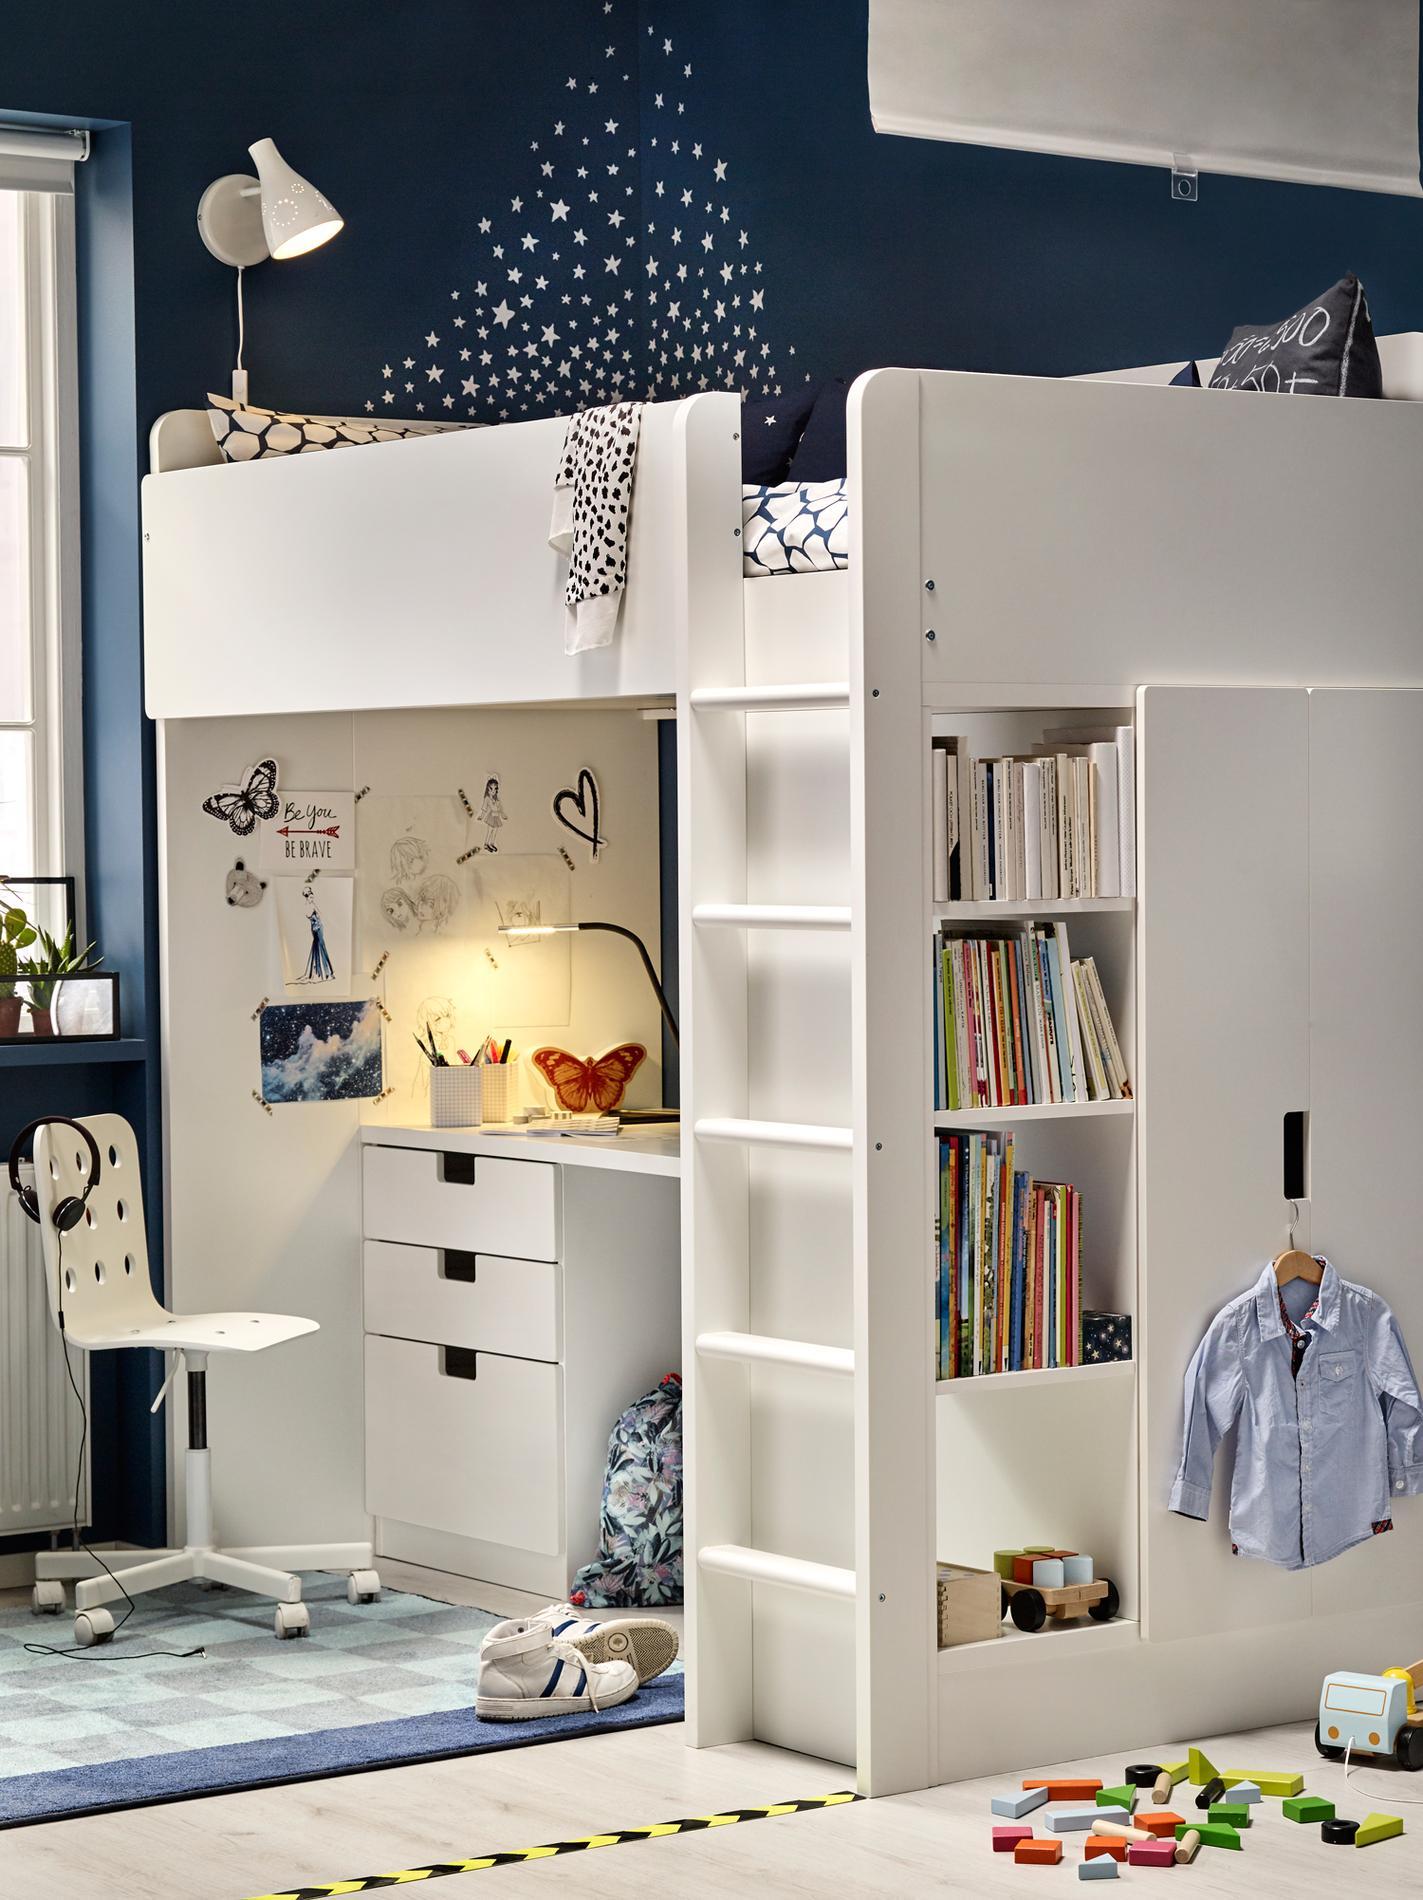 lit mezzanine ado ikea excellent ikea chambre ado un lit mezzanine dans la chambre des ados. Black Bedroom Furniture Sets. Home Design Ideas